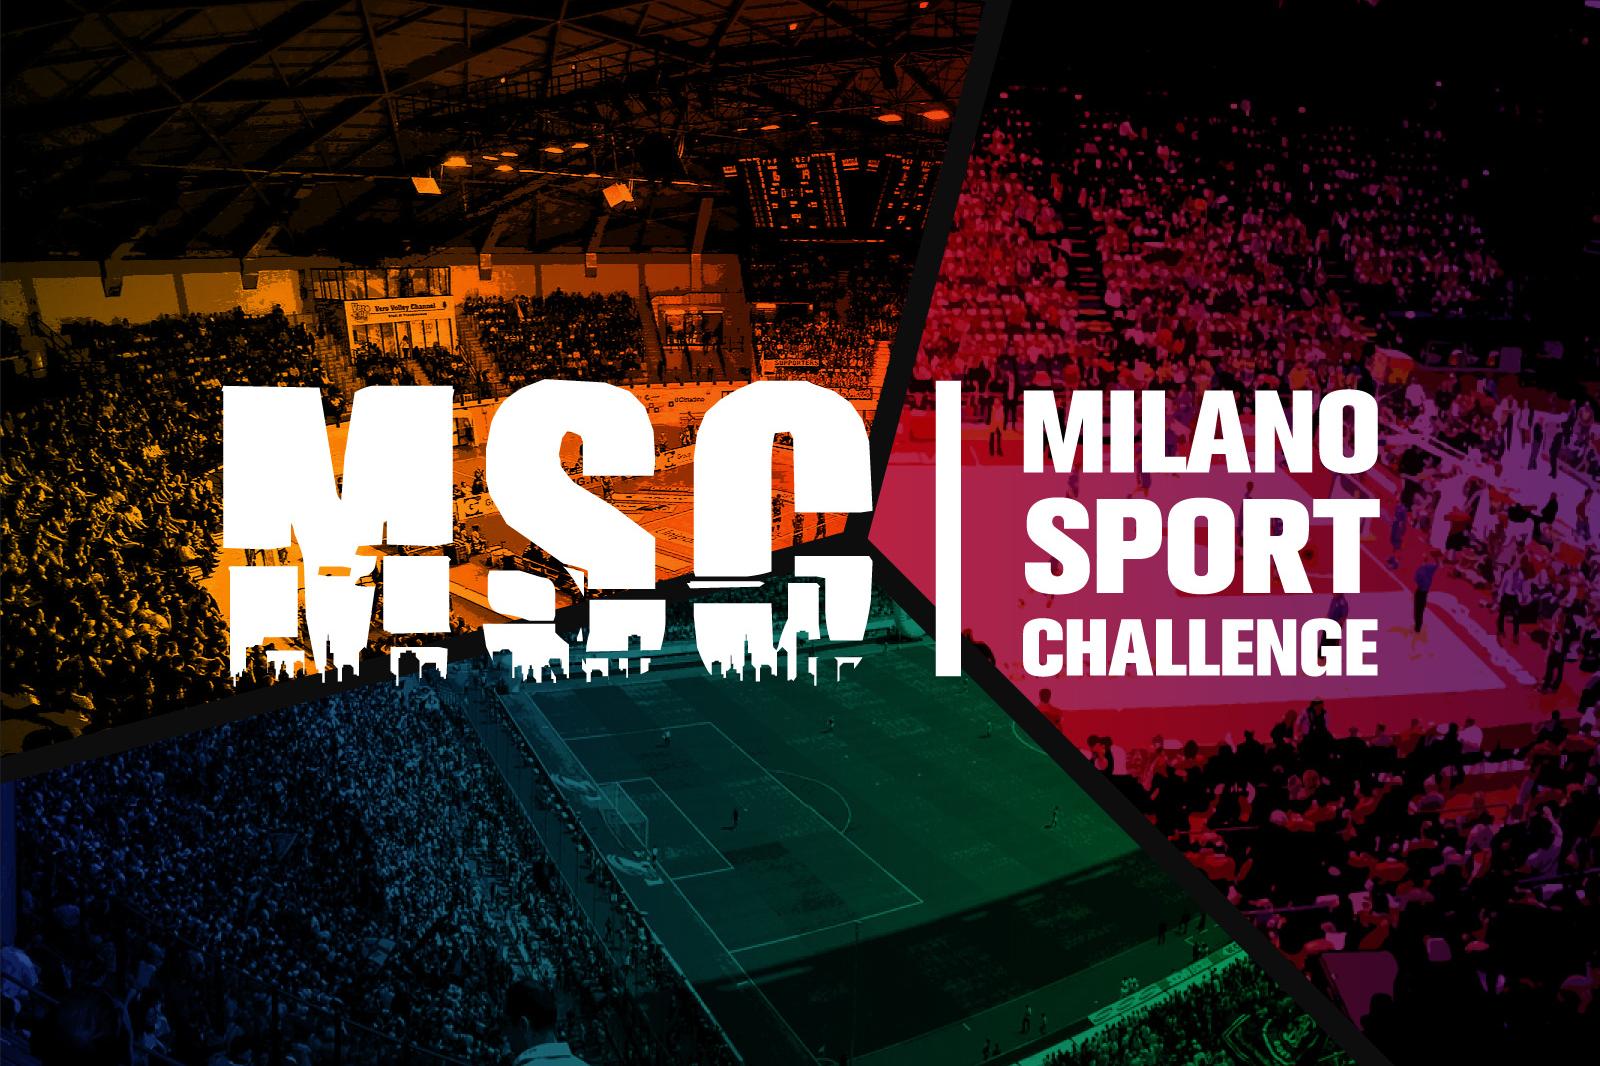 Milano Sport Challenge 3:2